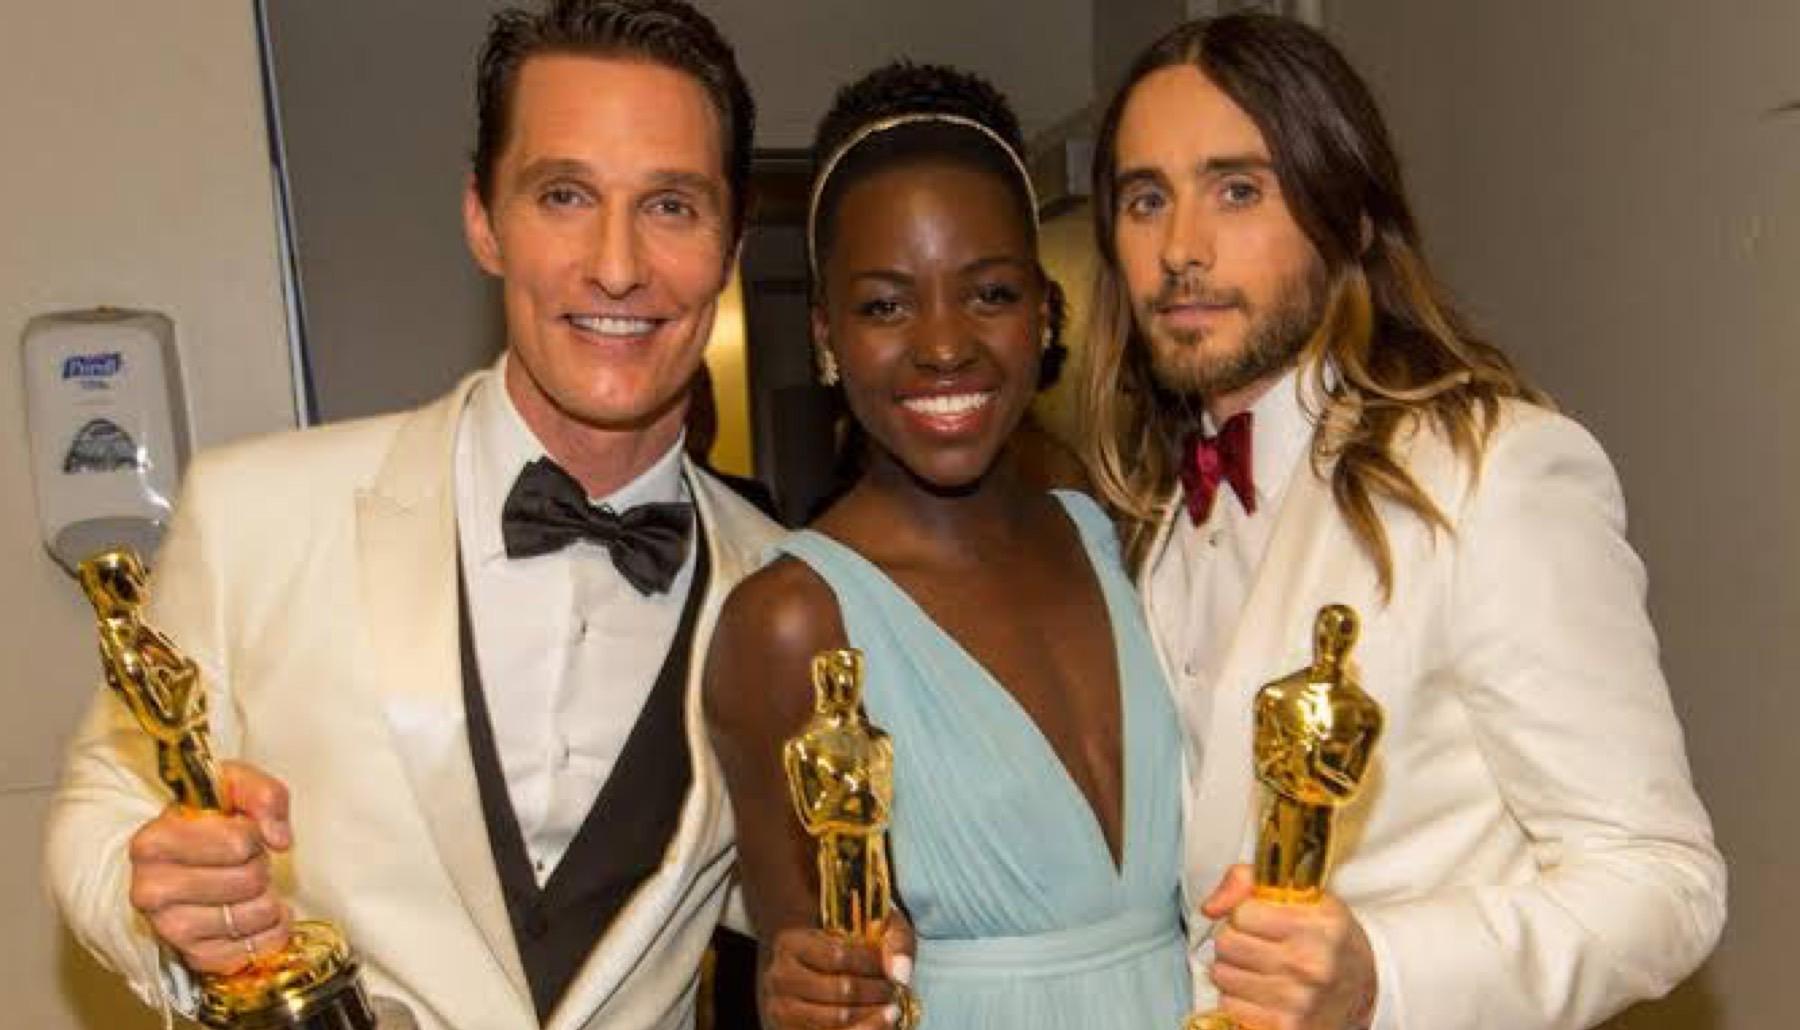 Matthew McConaughey, Lupita Nyong'o y Jared Leto